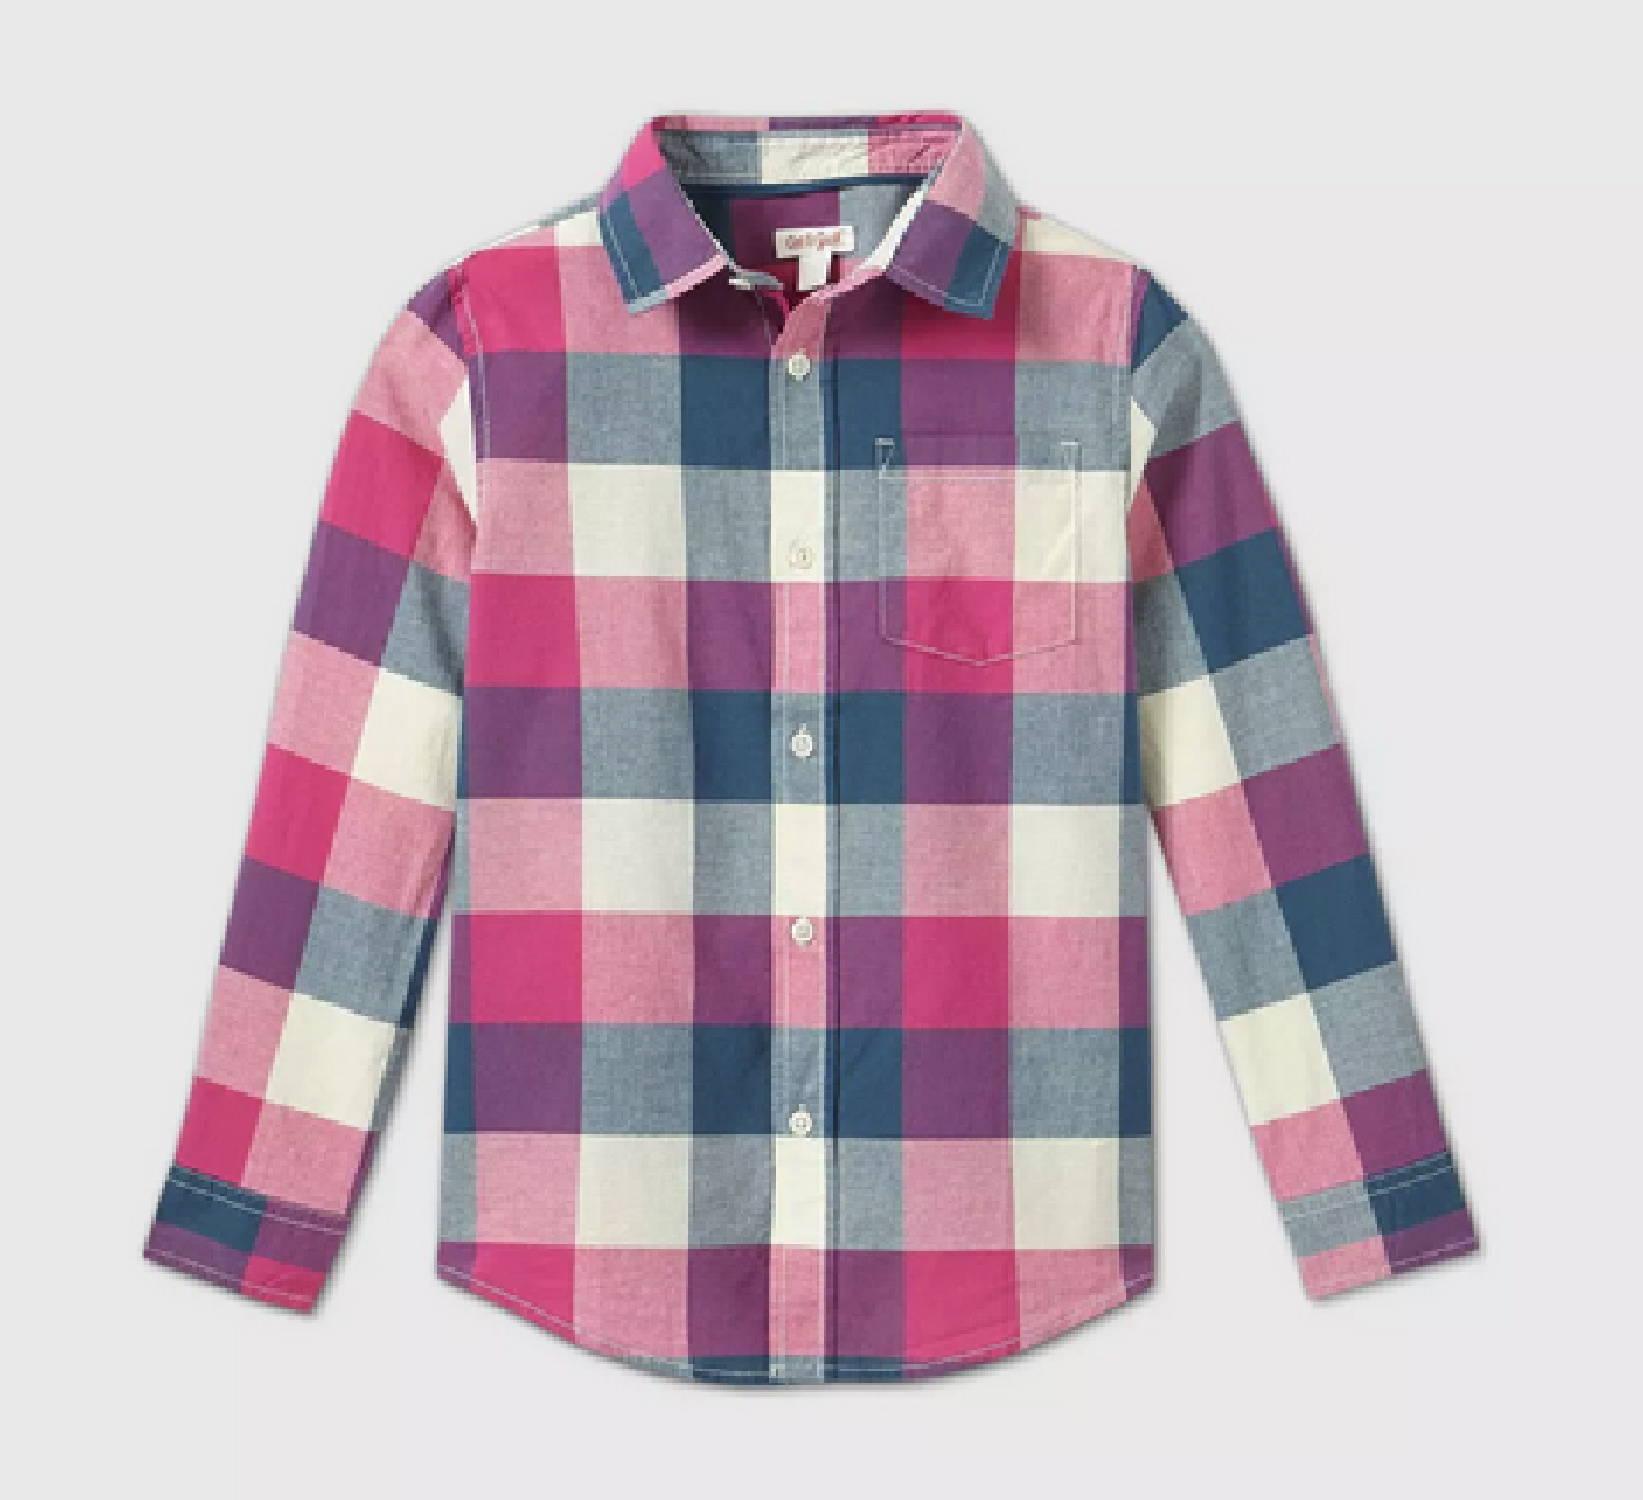 Ring Bearer Plaid Shirt